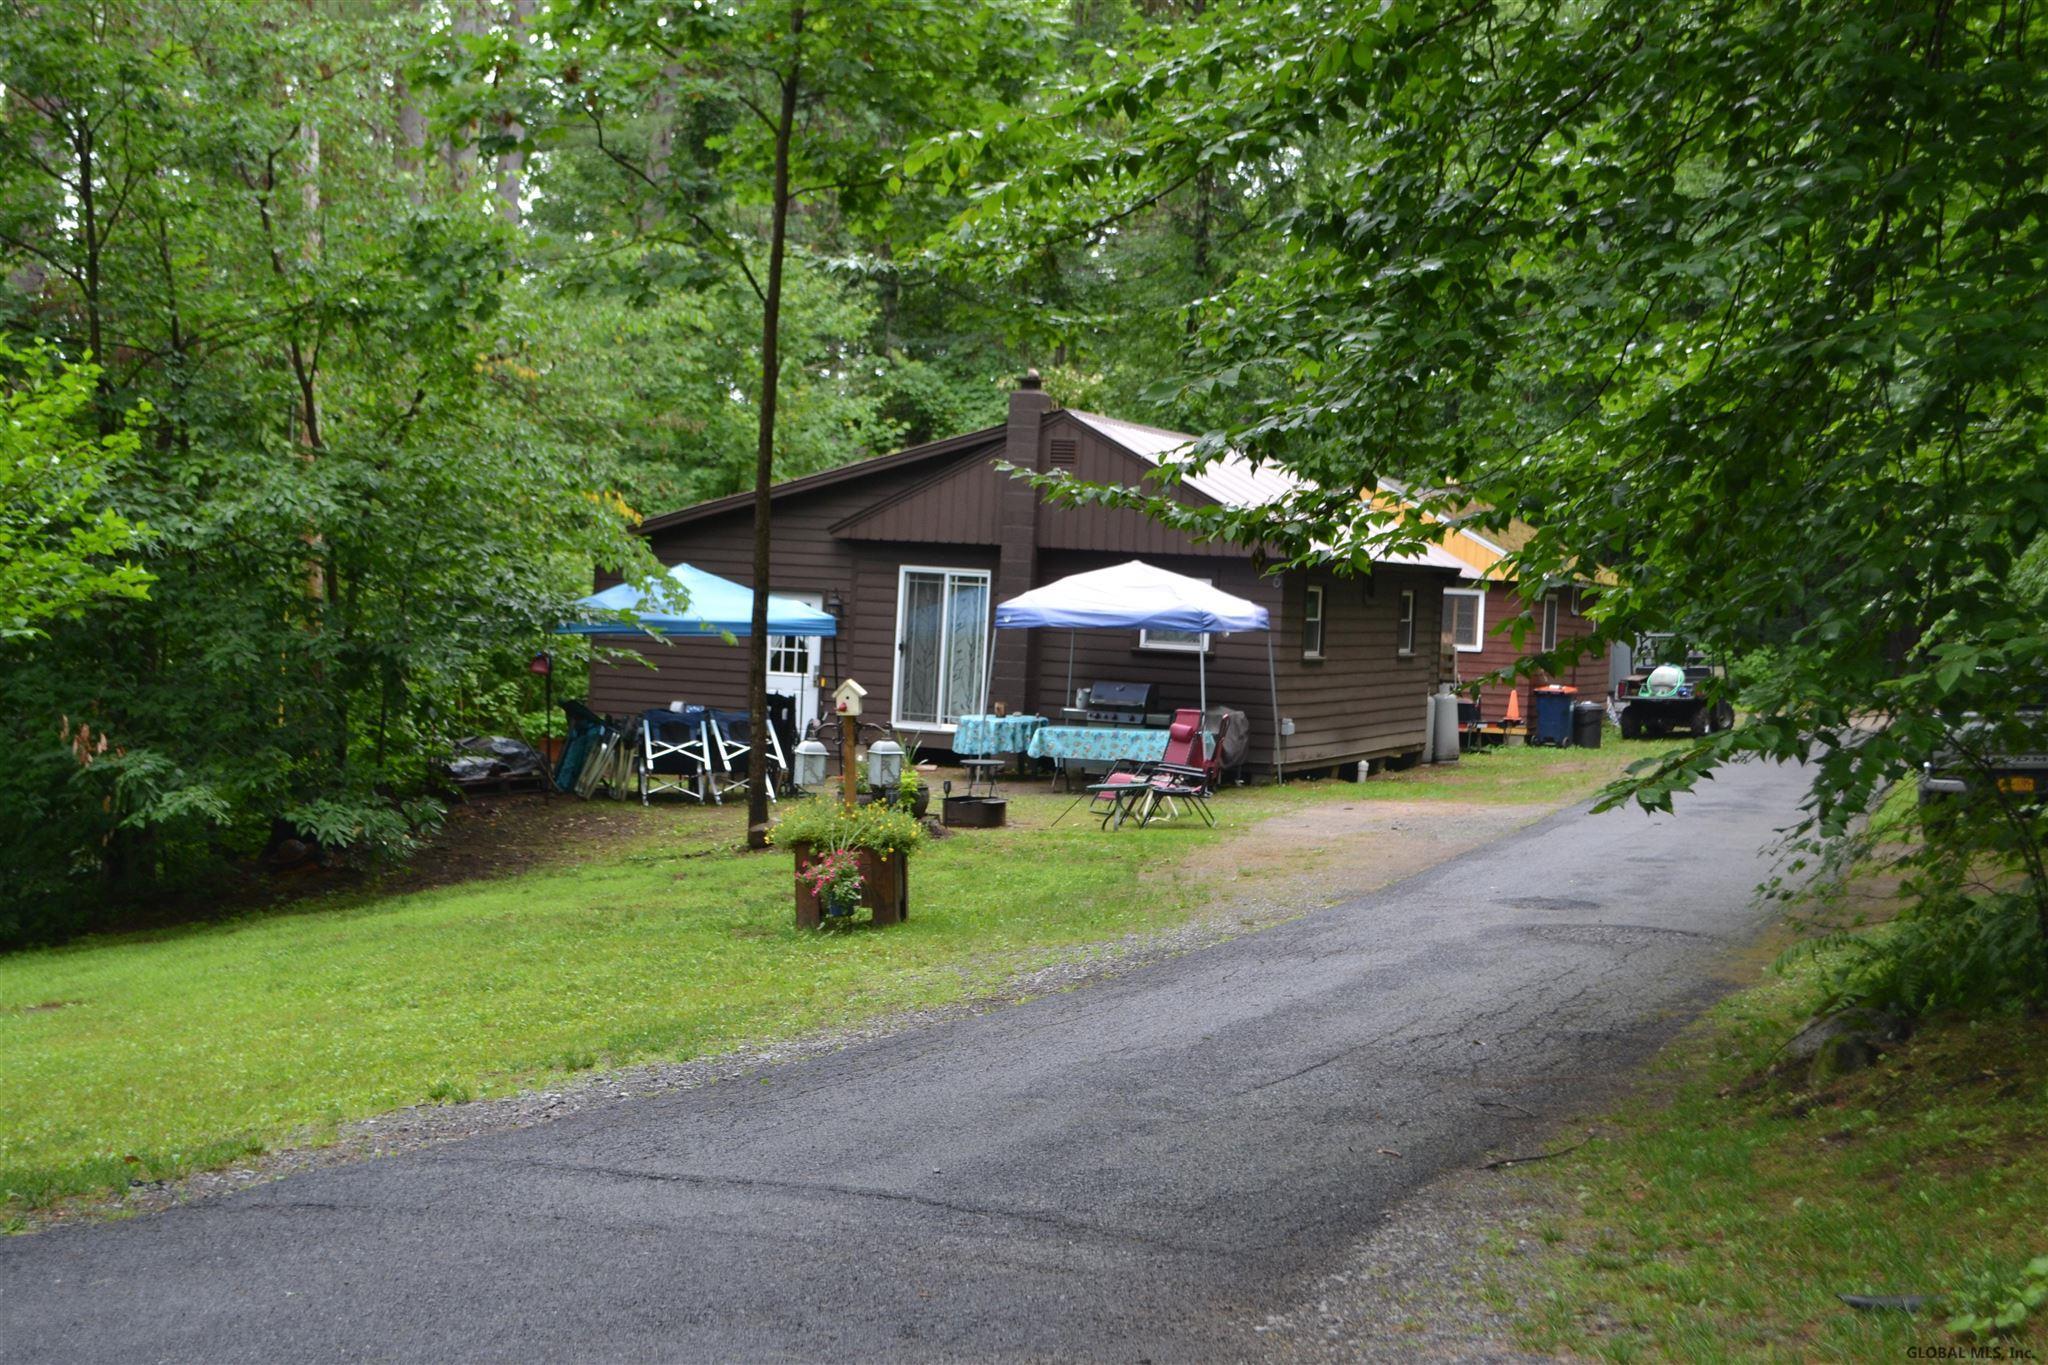 Lake Luzerne image 59